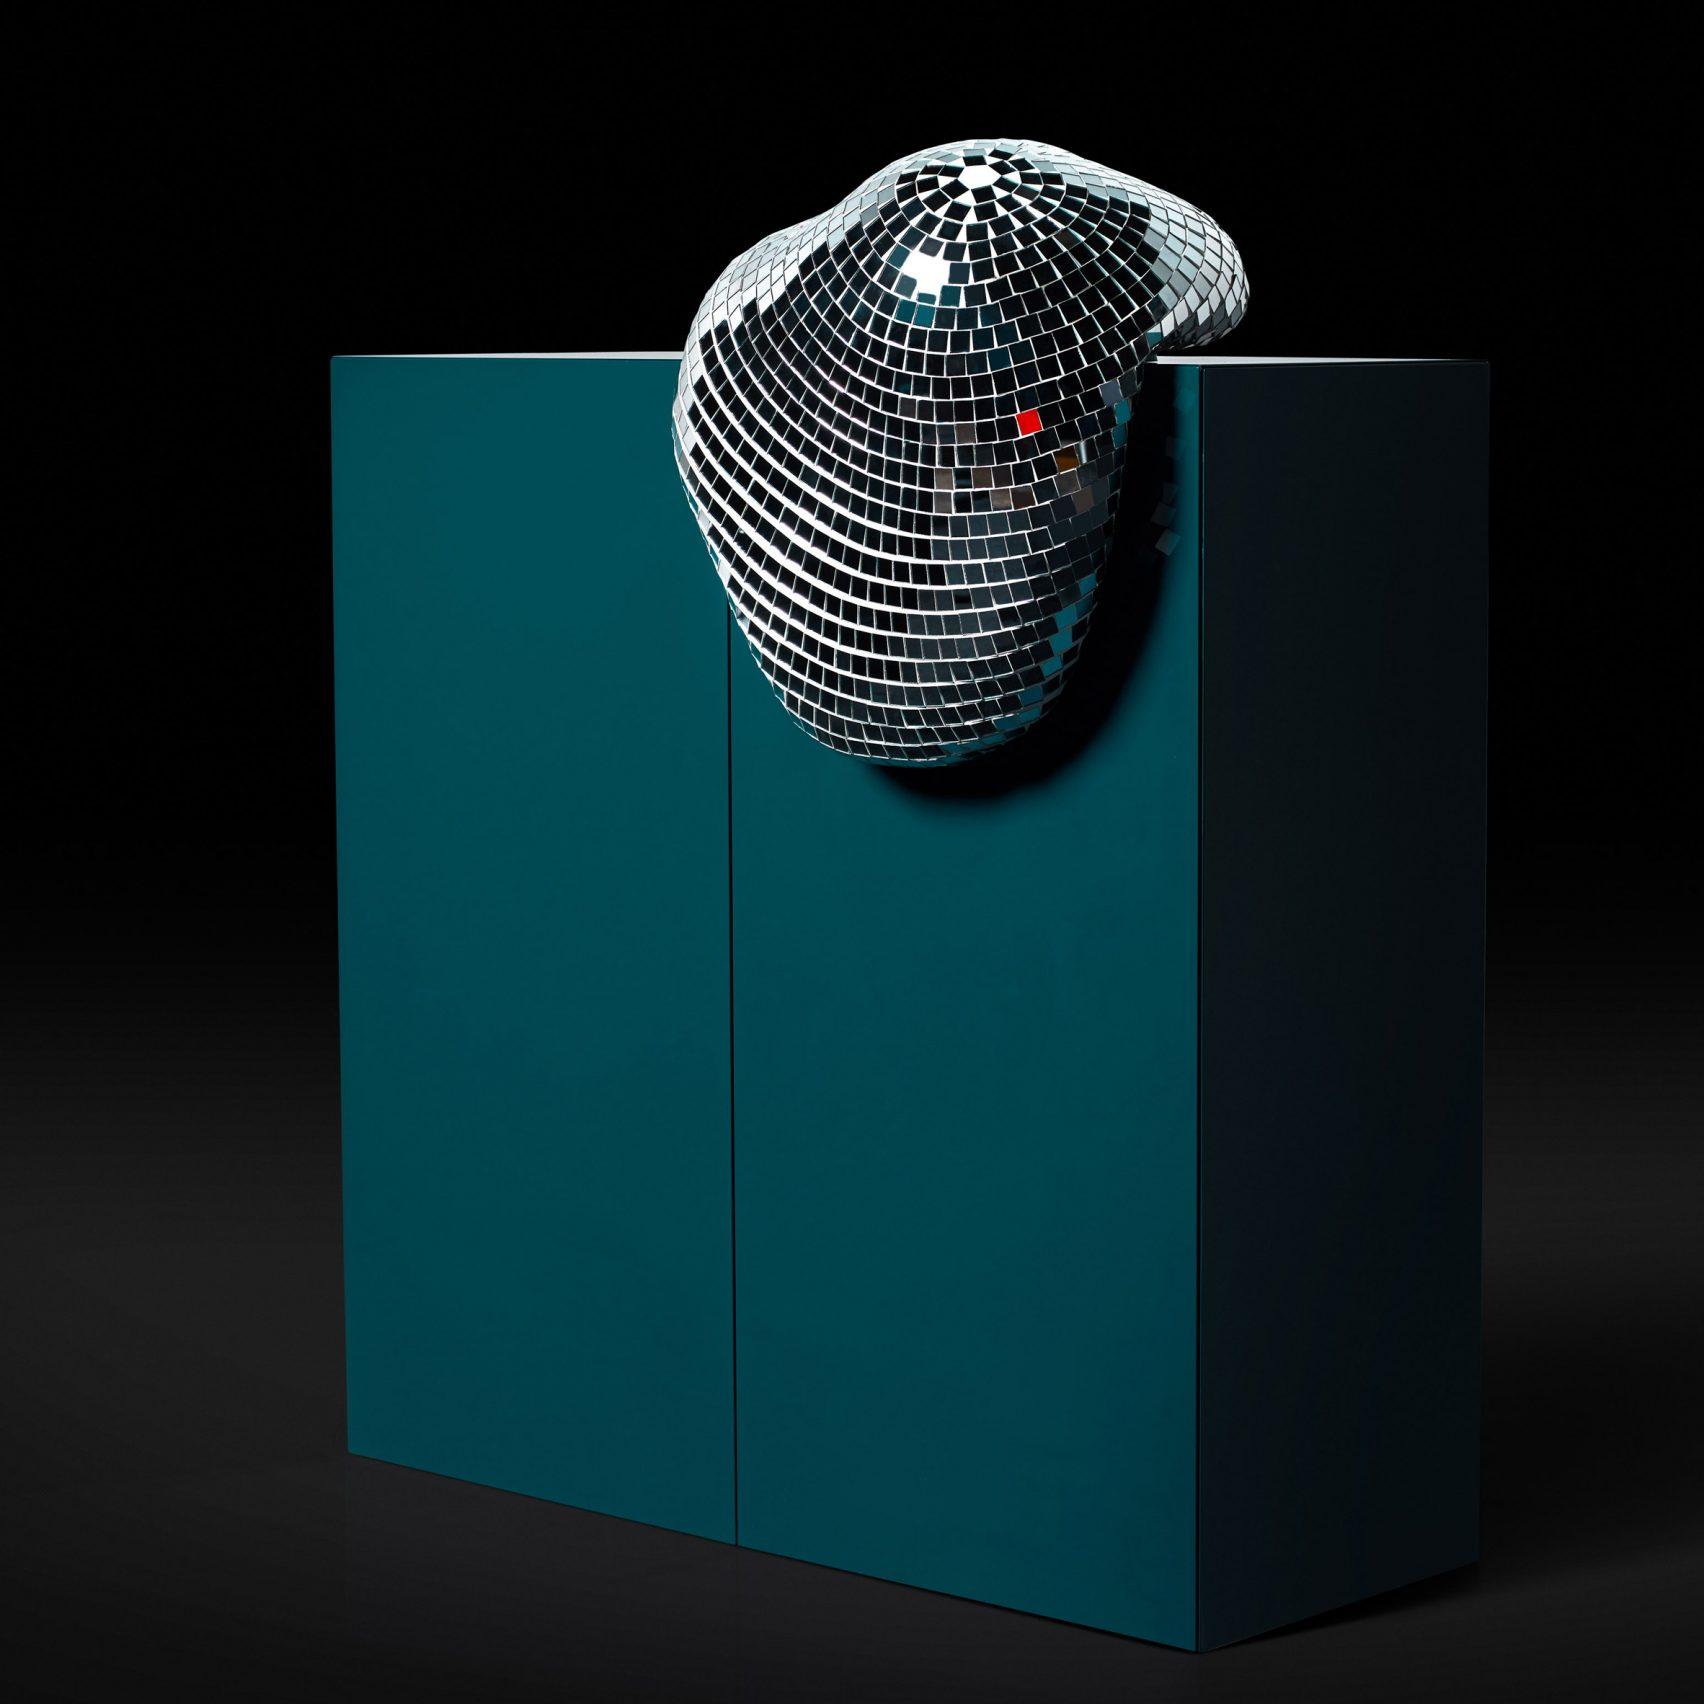 disco-gufram 2.jpg